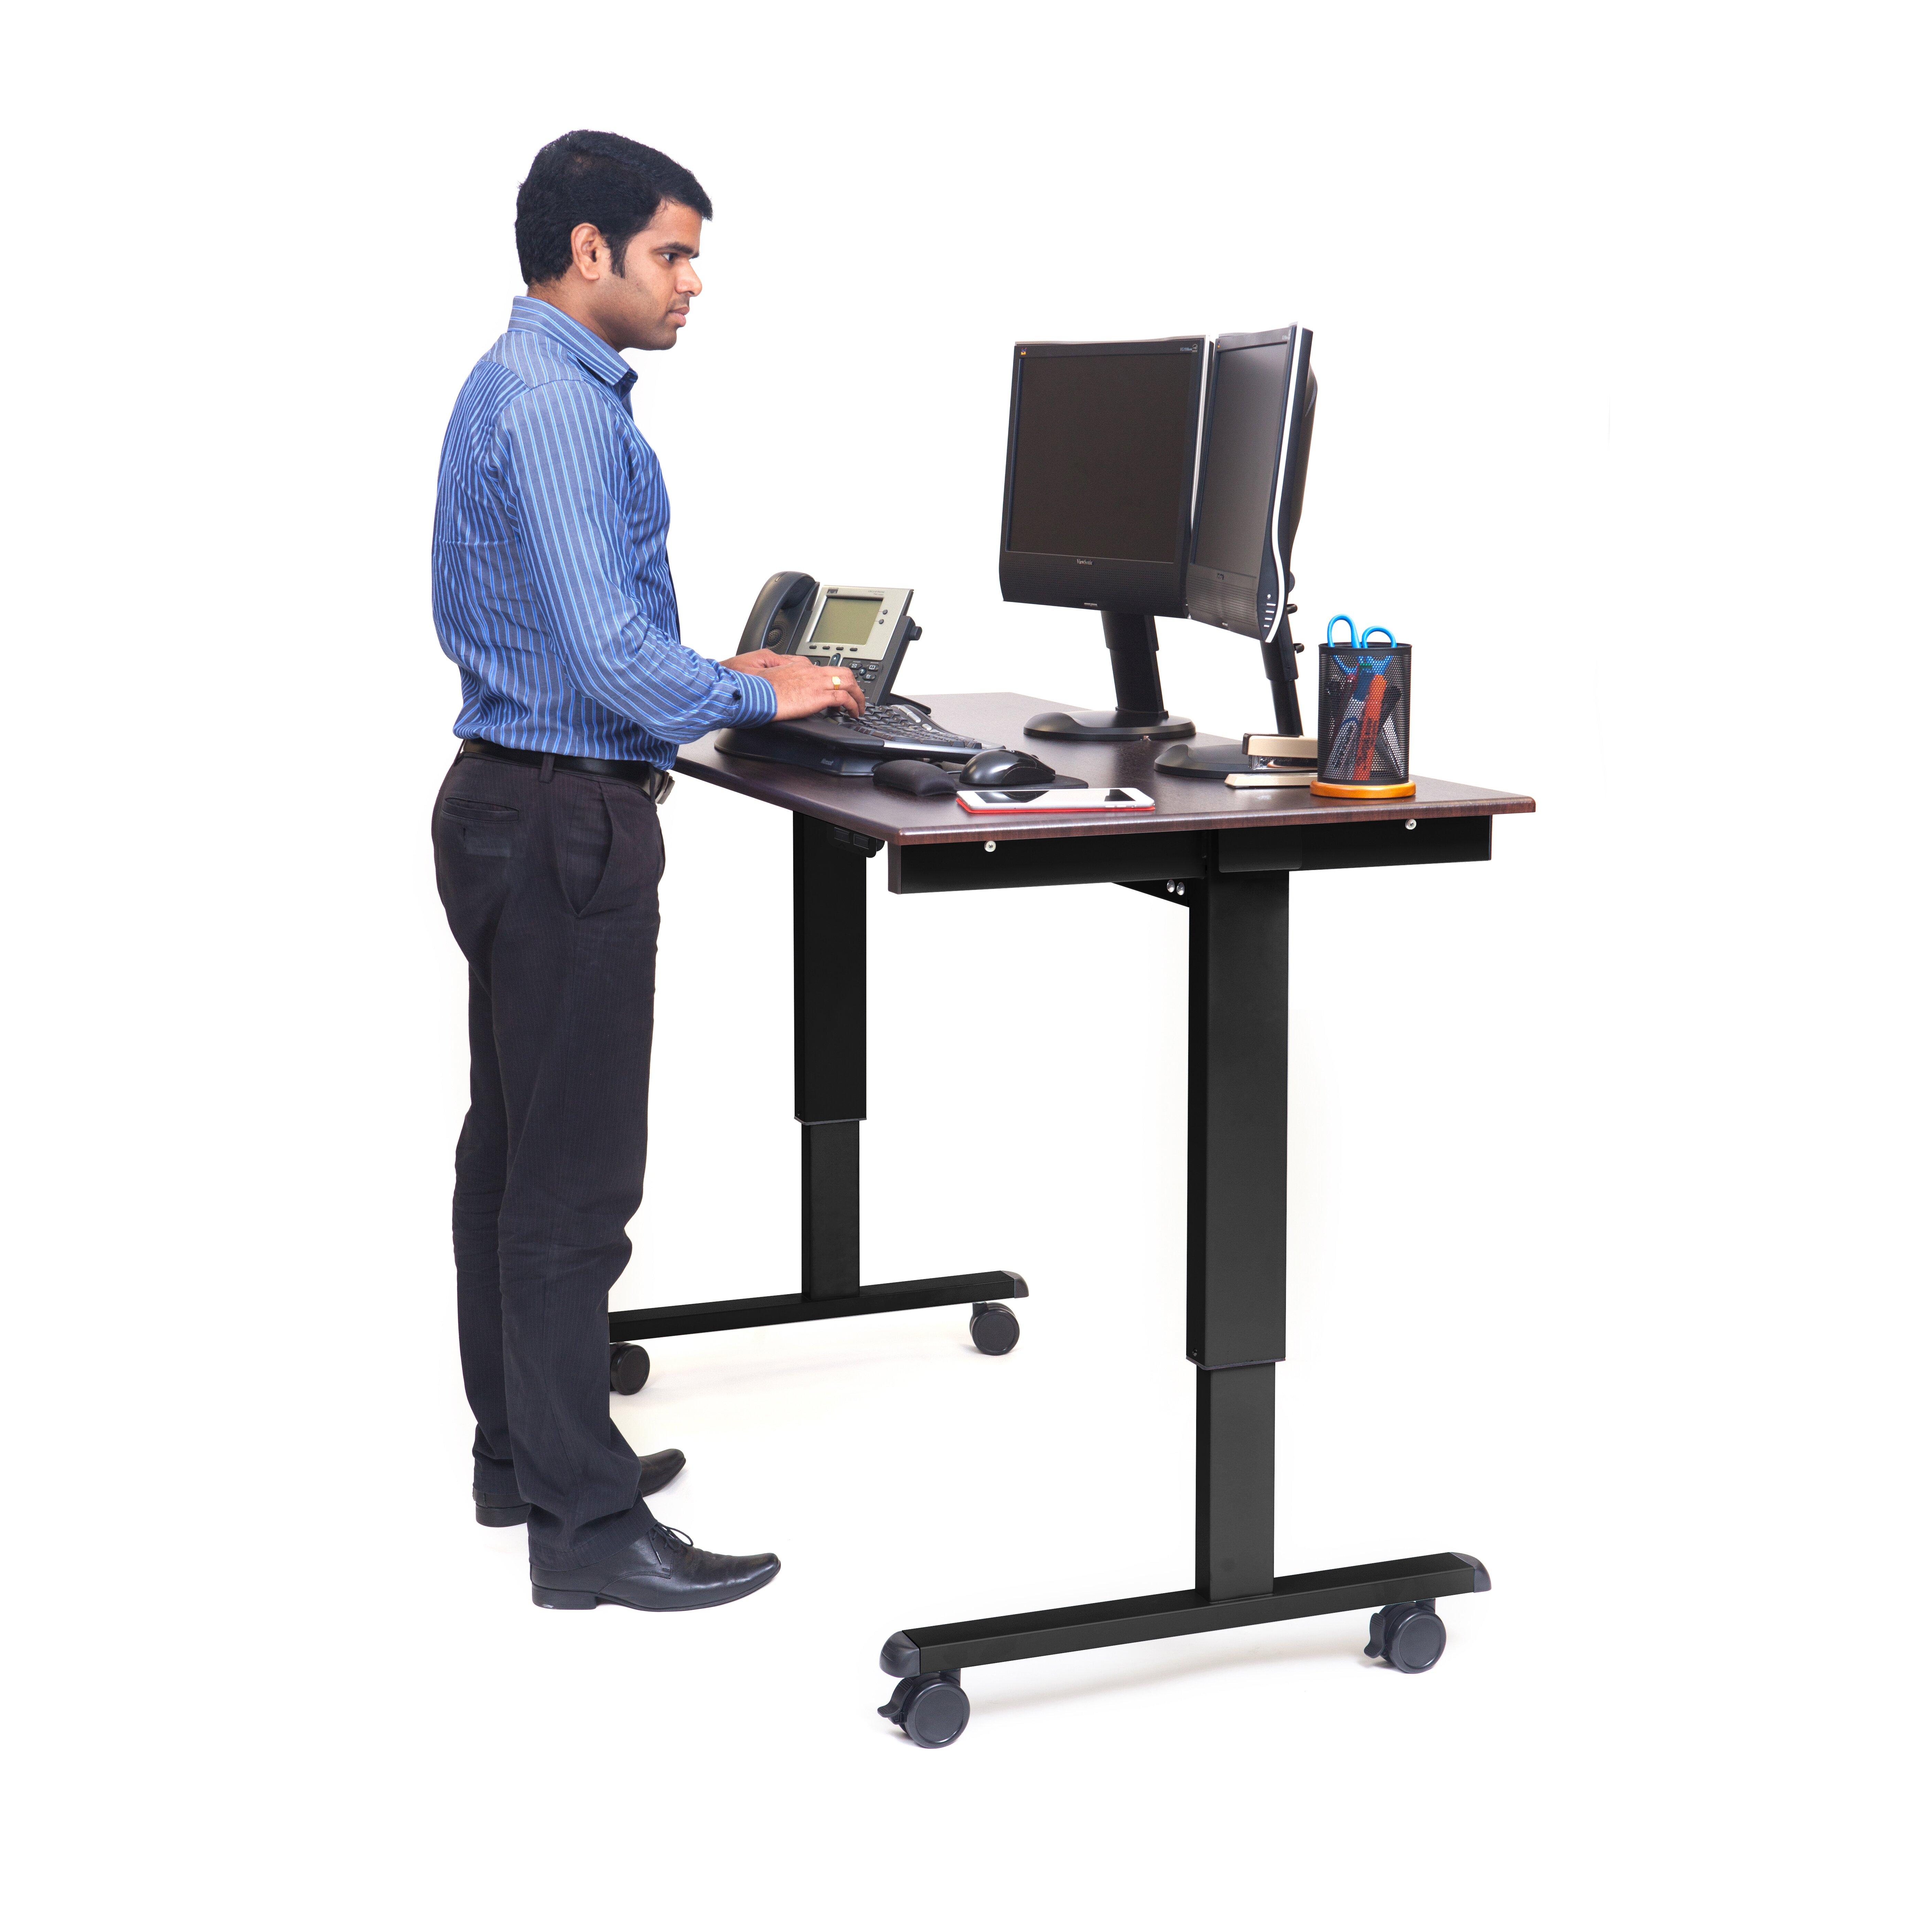 Luxor Height Adjustable Desk Wayfair Supply